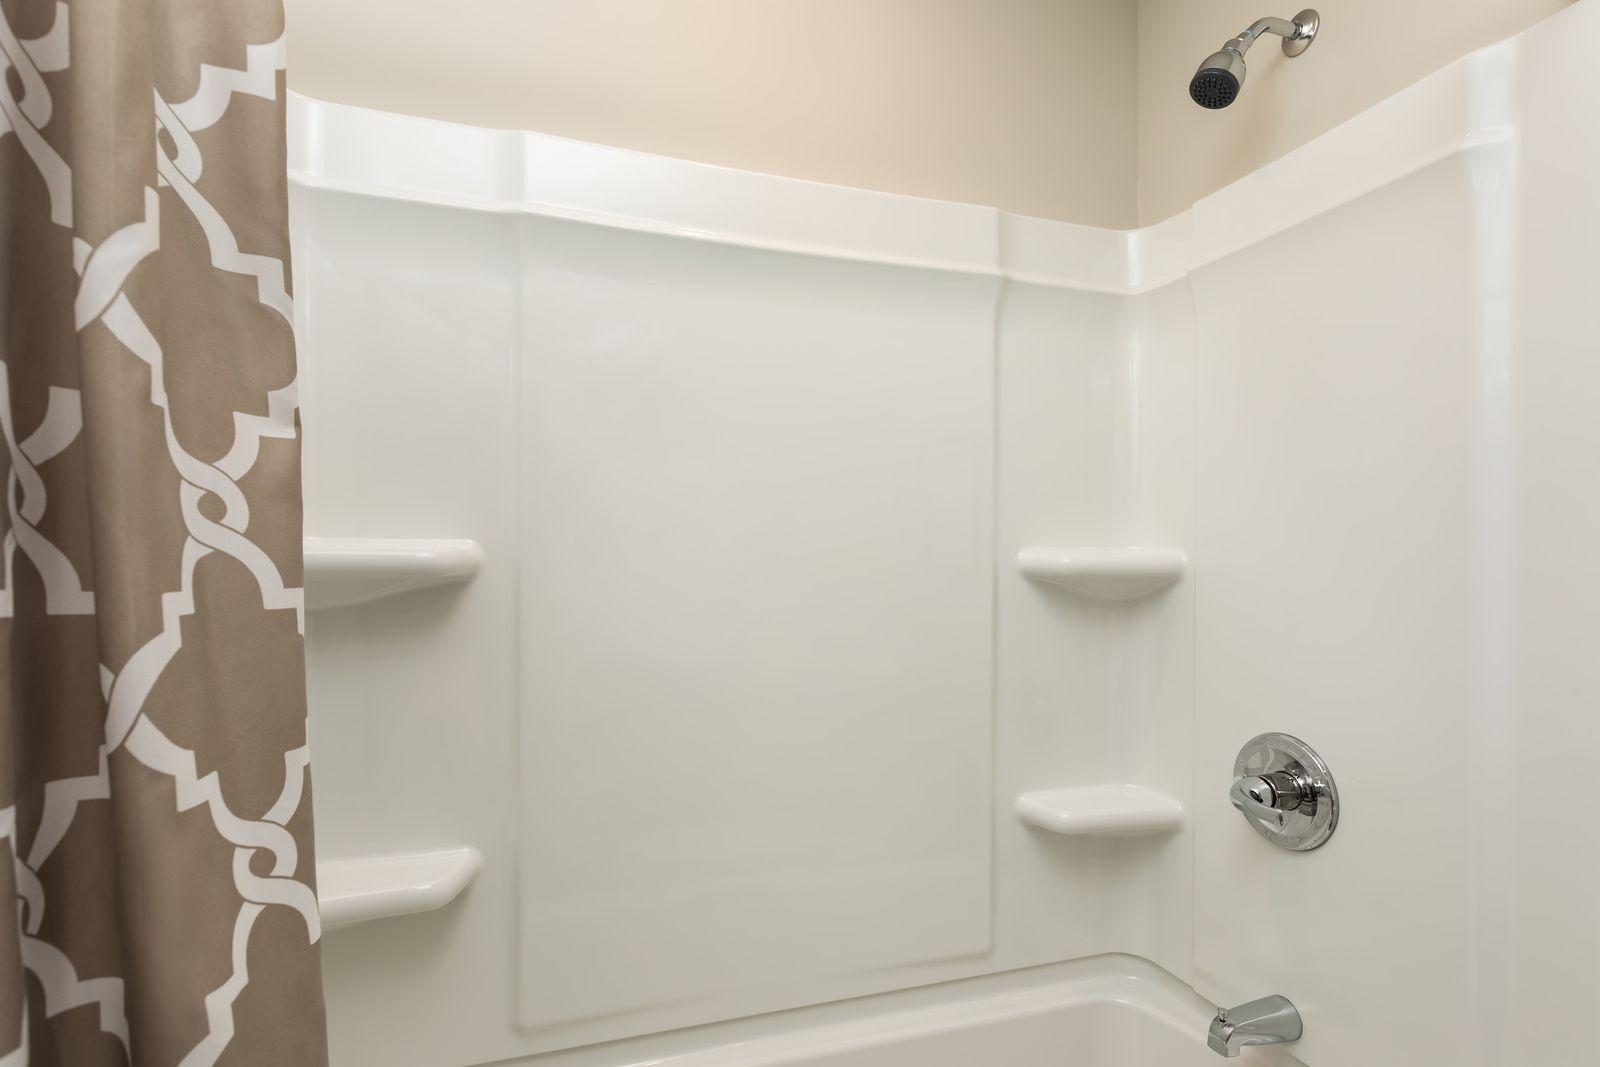 Bathroom featured in the Spruce By Ryan Homes in Buffalo-Niagara Falls, NY